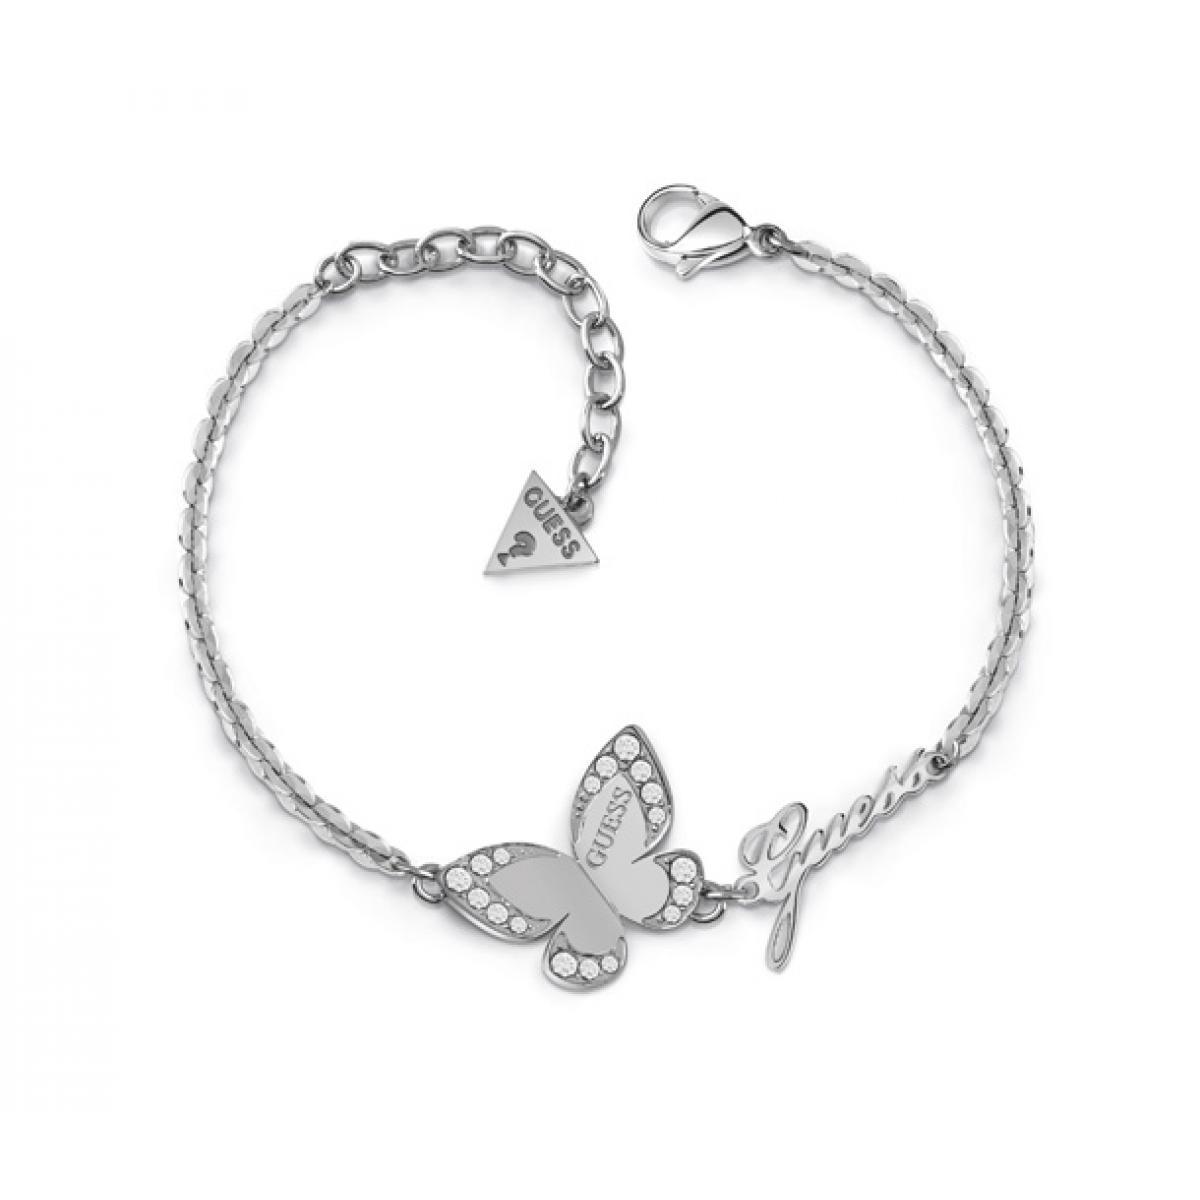 bracelet femme argent guess